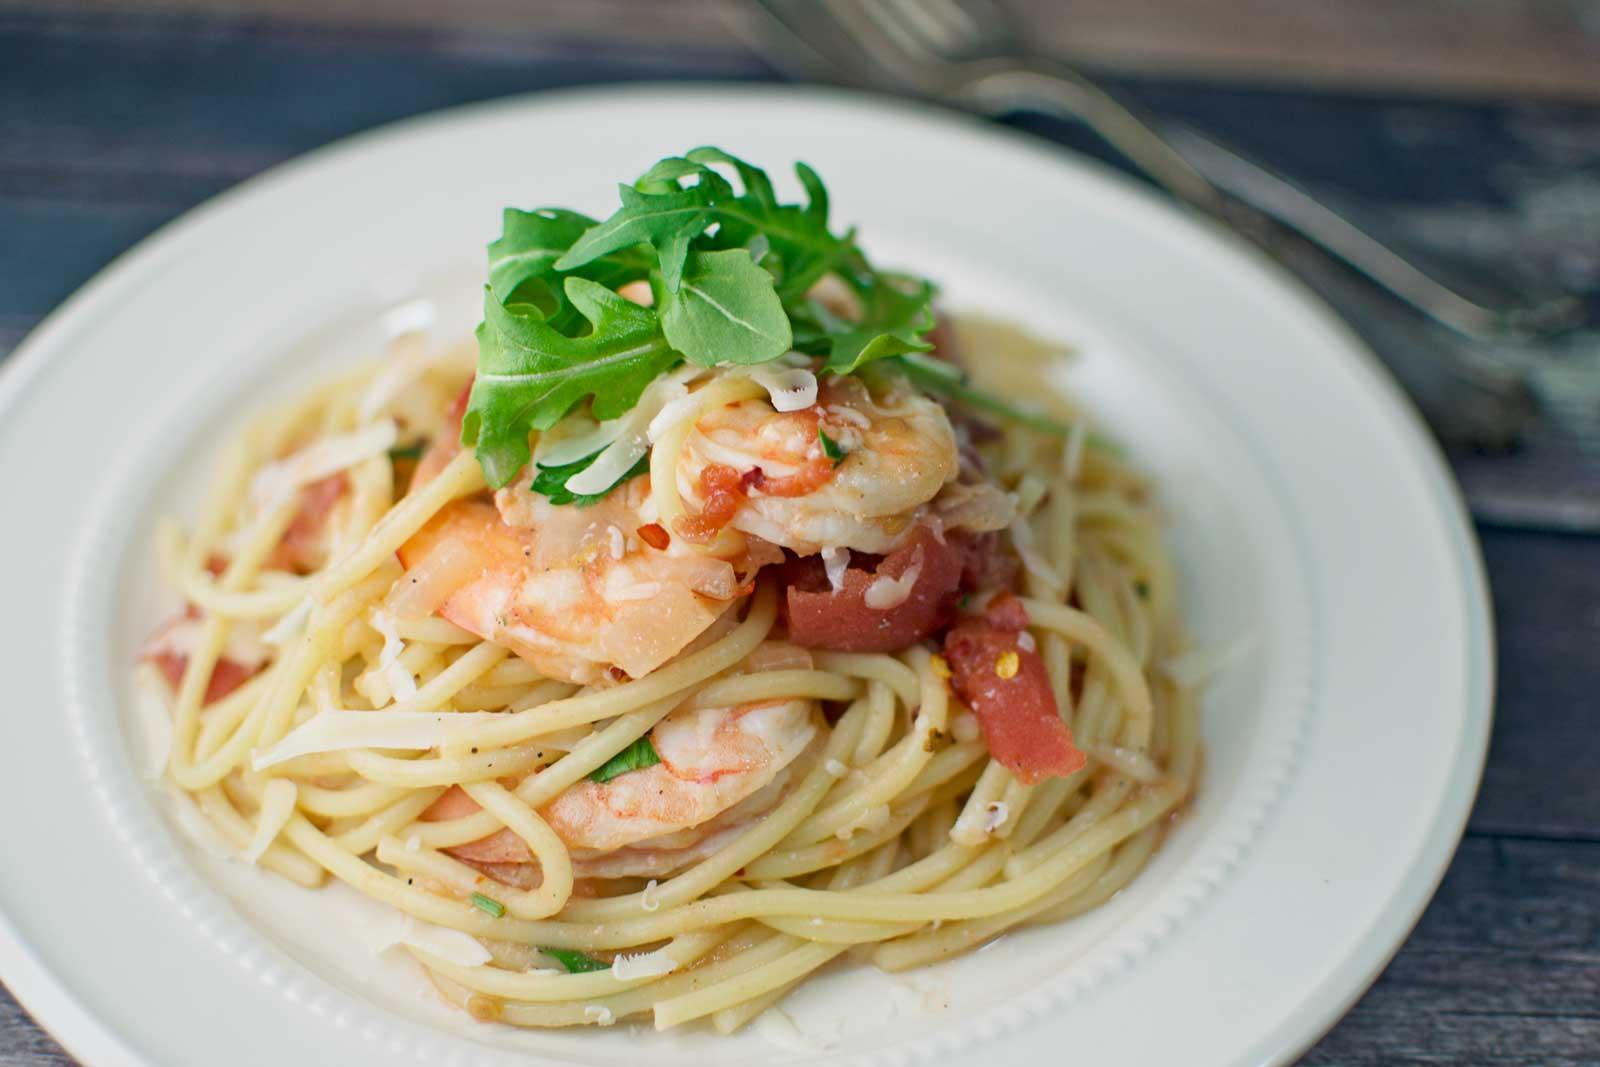 Spicy Shrimp with Pasta